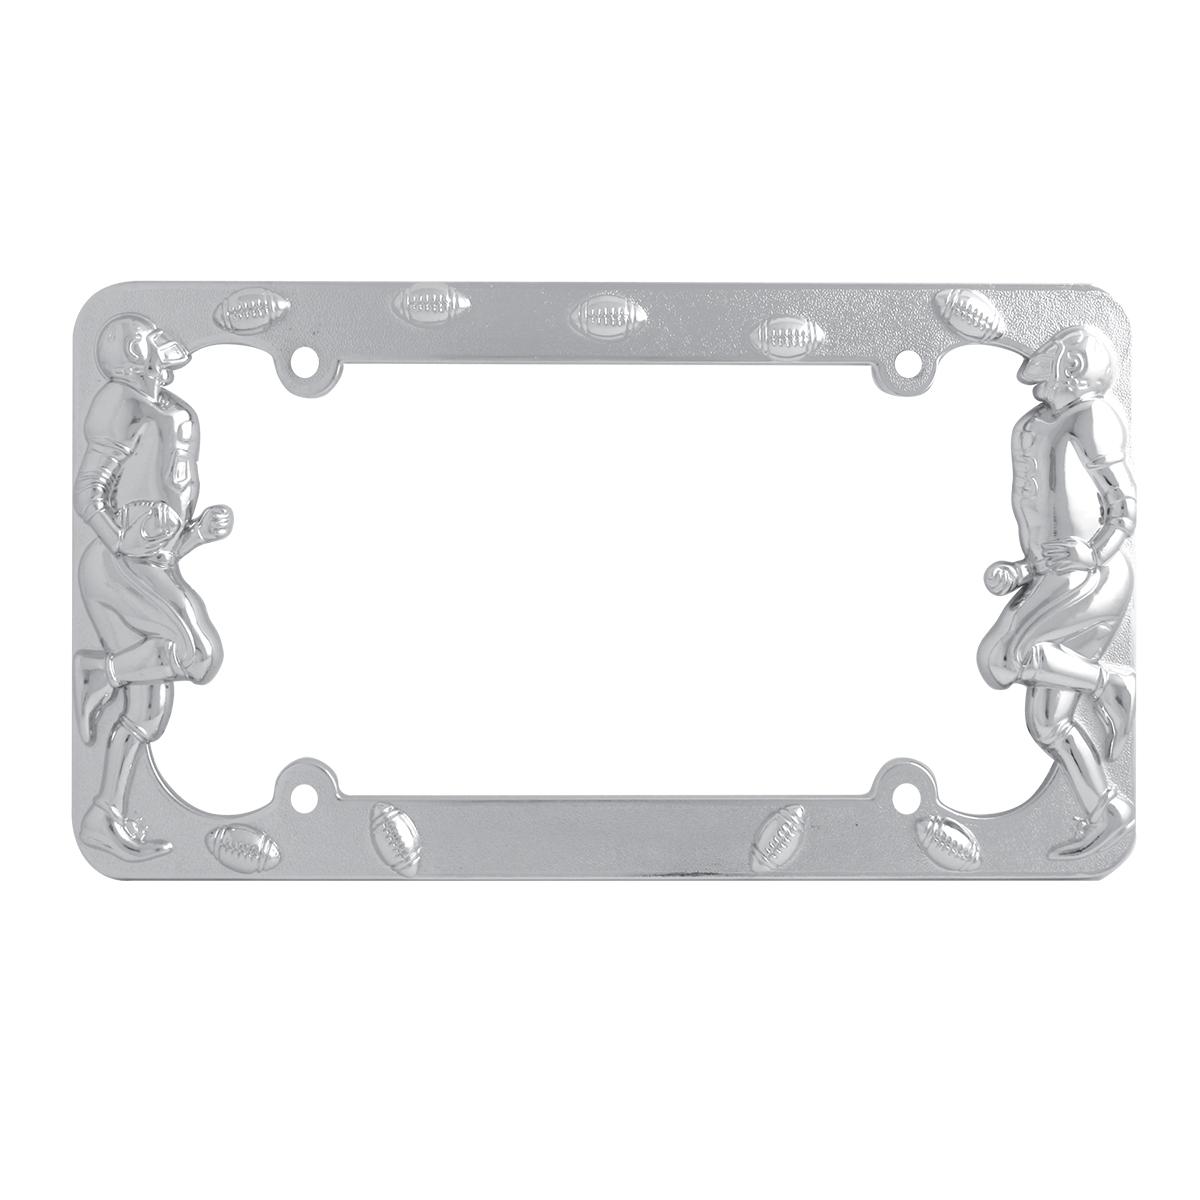 60460 Football Player License Plate Frame